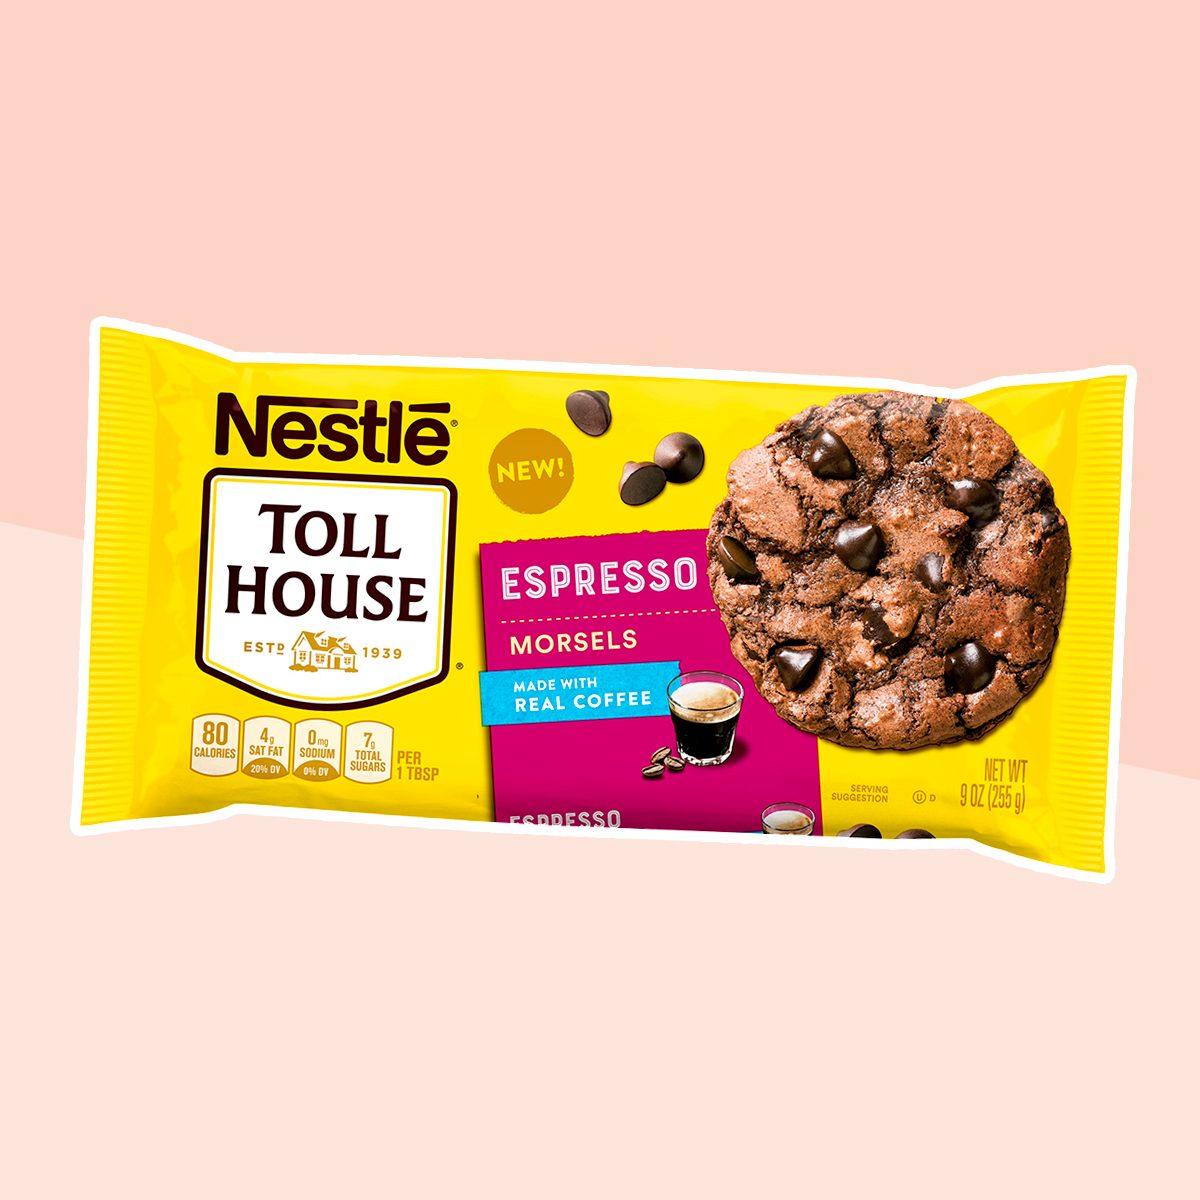 Nestlé Toll House Espresso Baking Chips